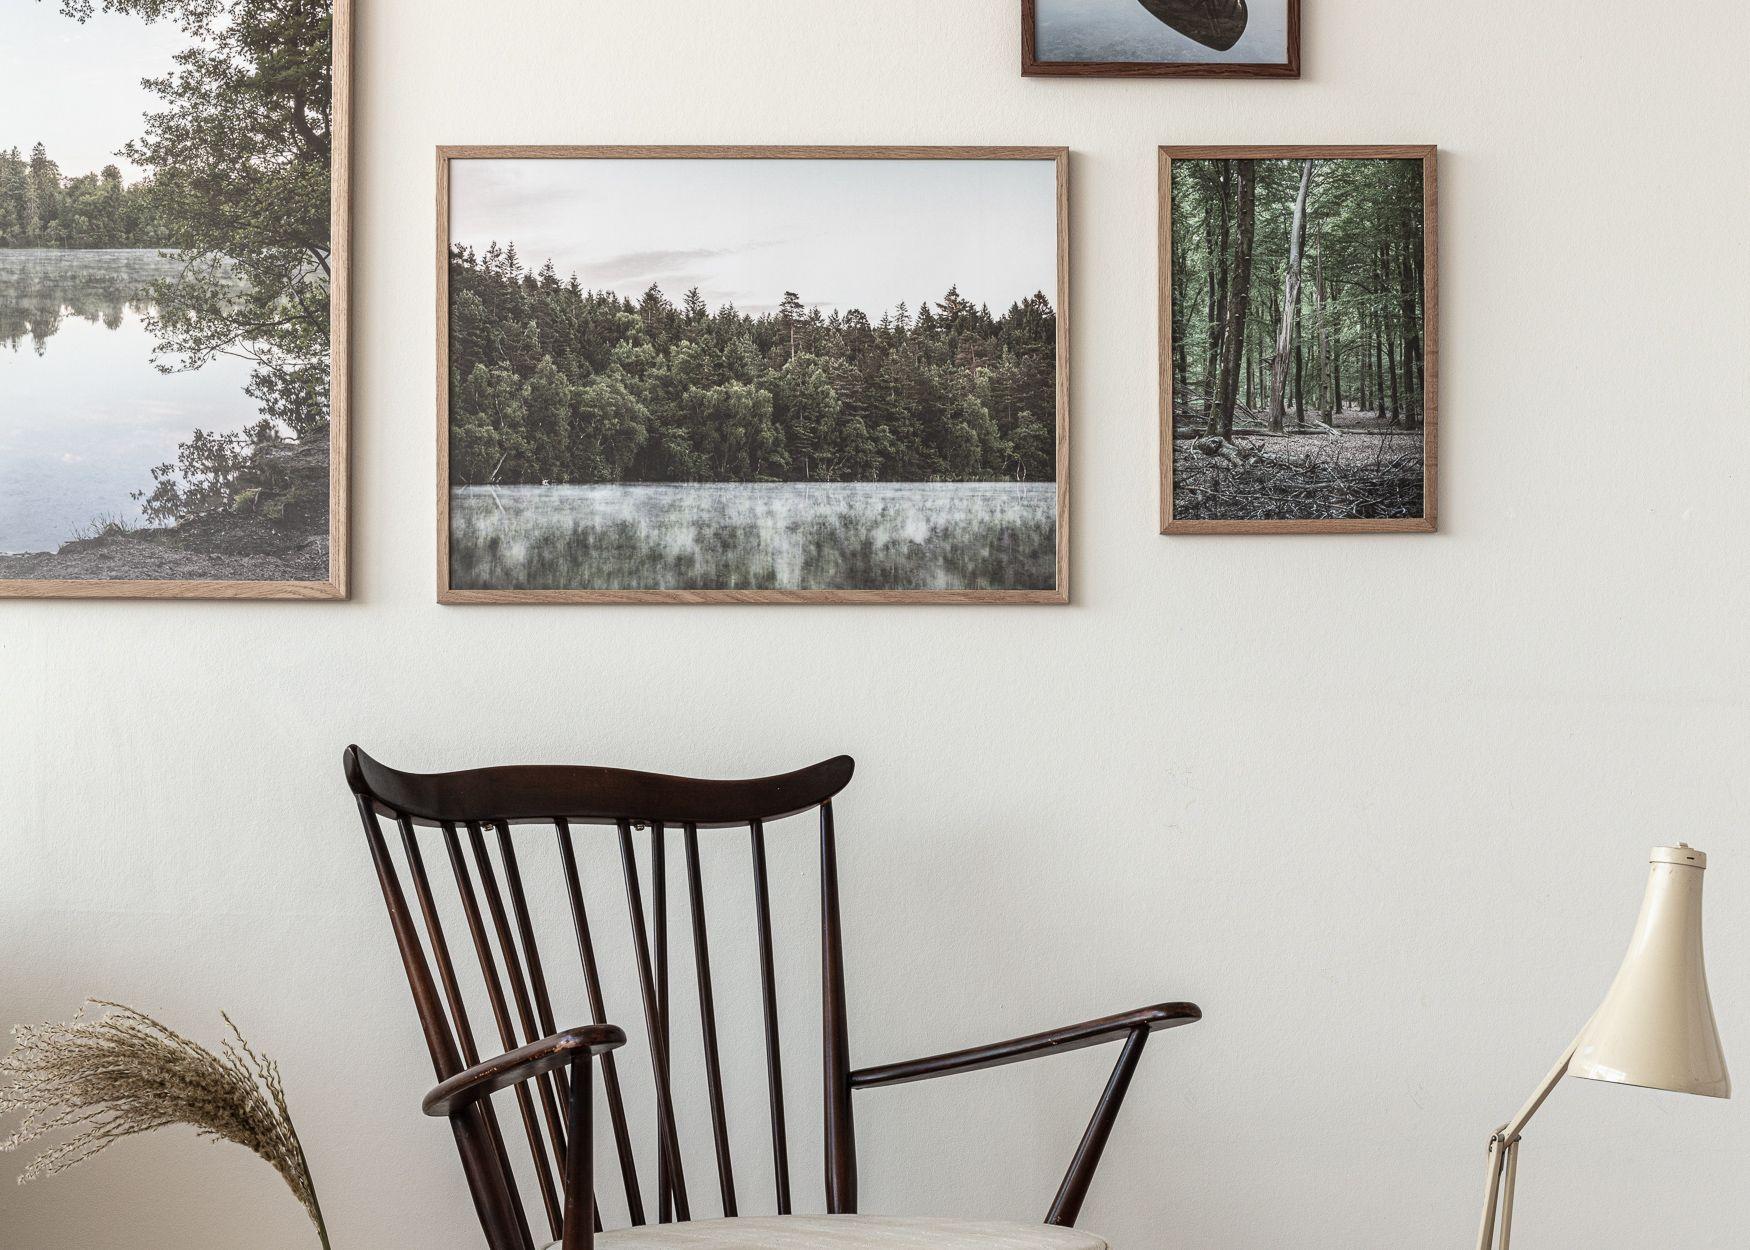 Den Danske Naturfond Danmarks Natur Decor Rocking Chair Photography